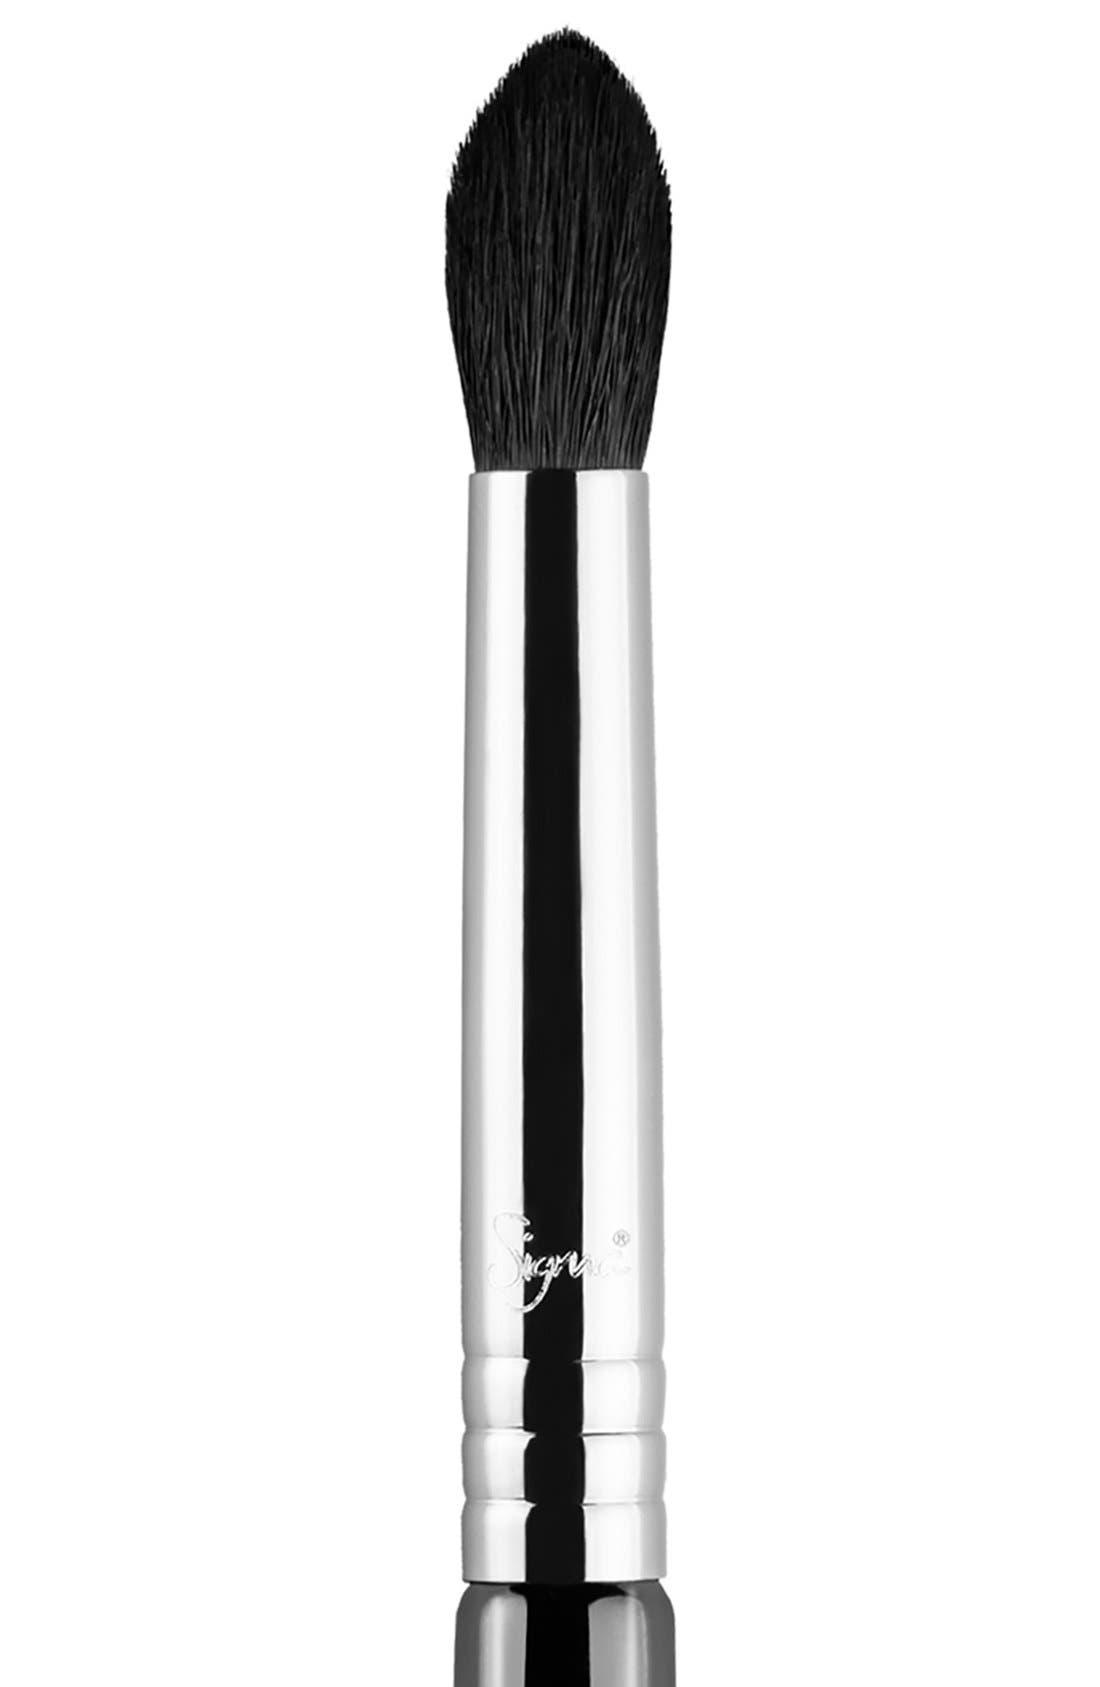 E45 Small Tapered Blending Brush,                             Alternate thumbnail 2, color,                             NO COLOR